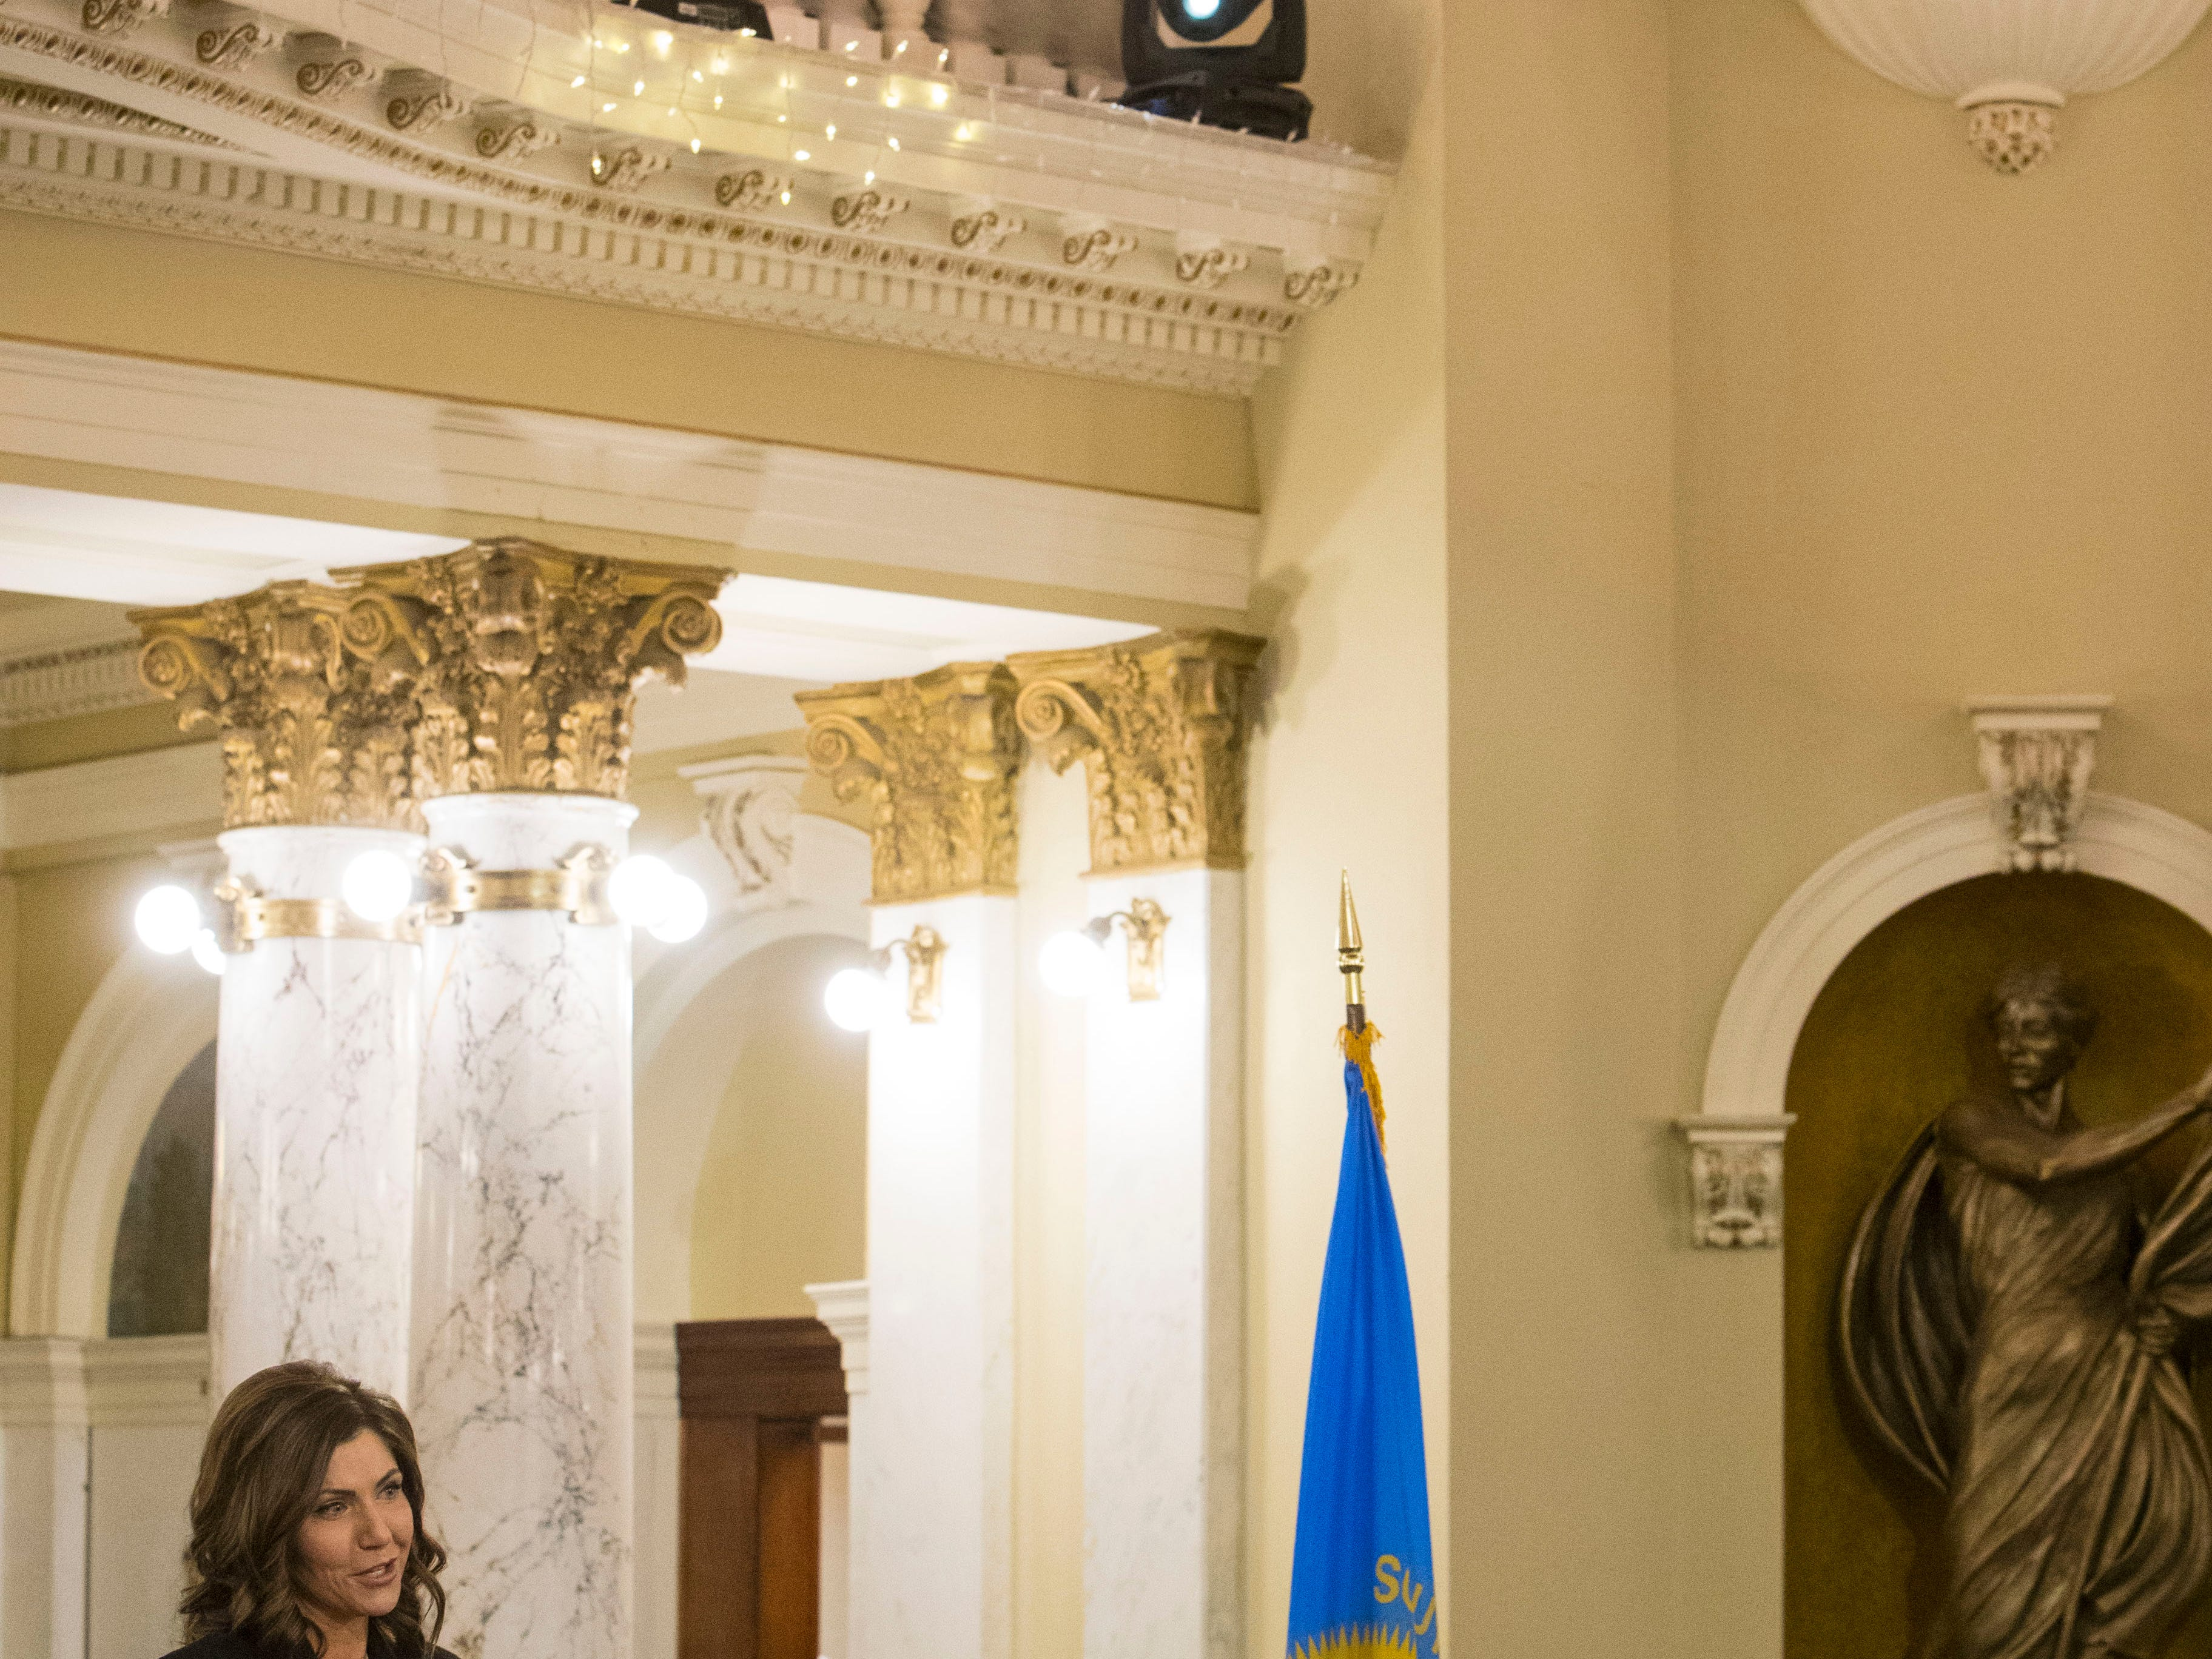 Gov. Kristi Noem speaks Saturday, Jan. 5, 2019, after being sworn-in as South DakotaÕs 33rd and first female governor in Pierre, S.D.